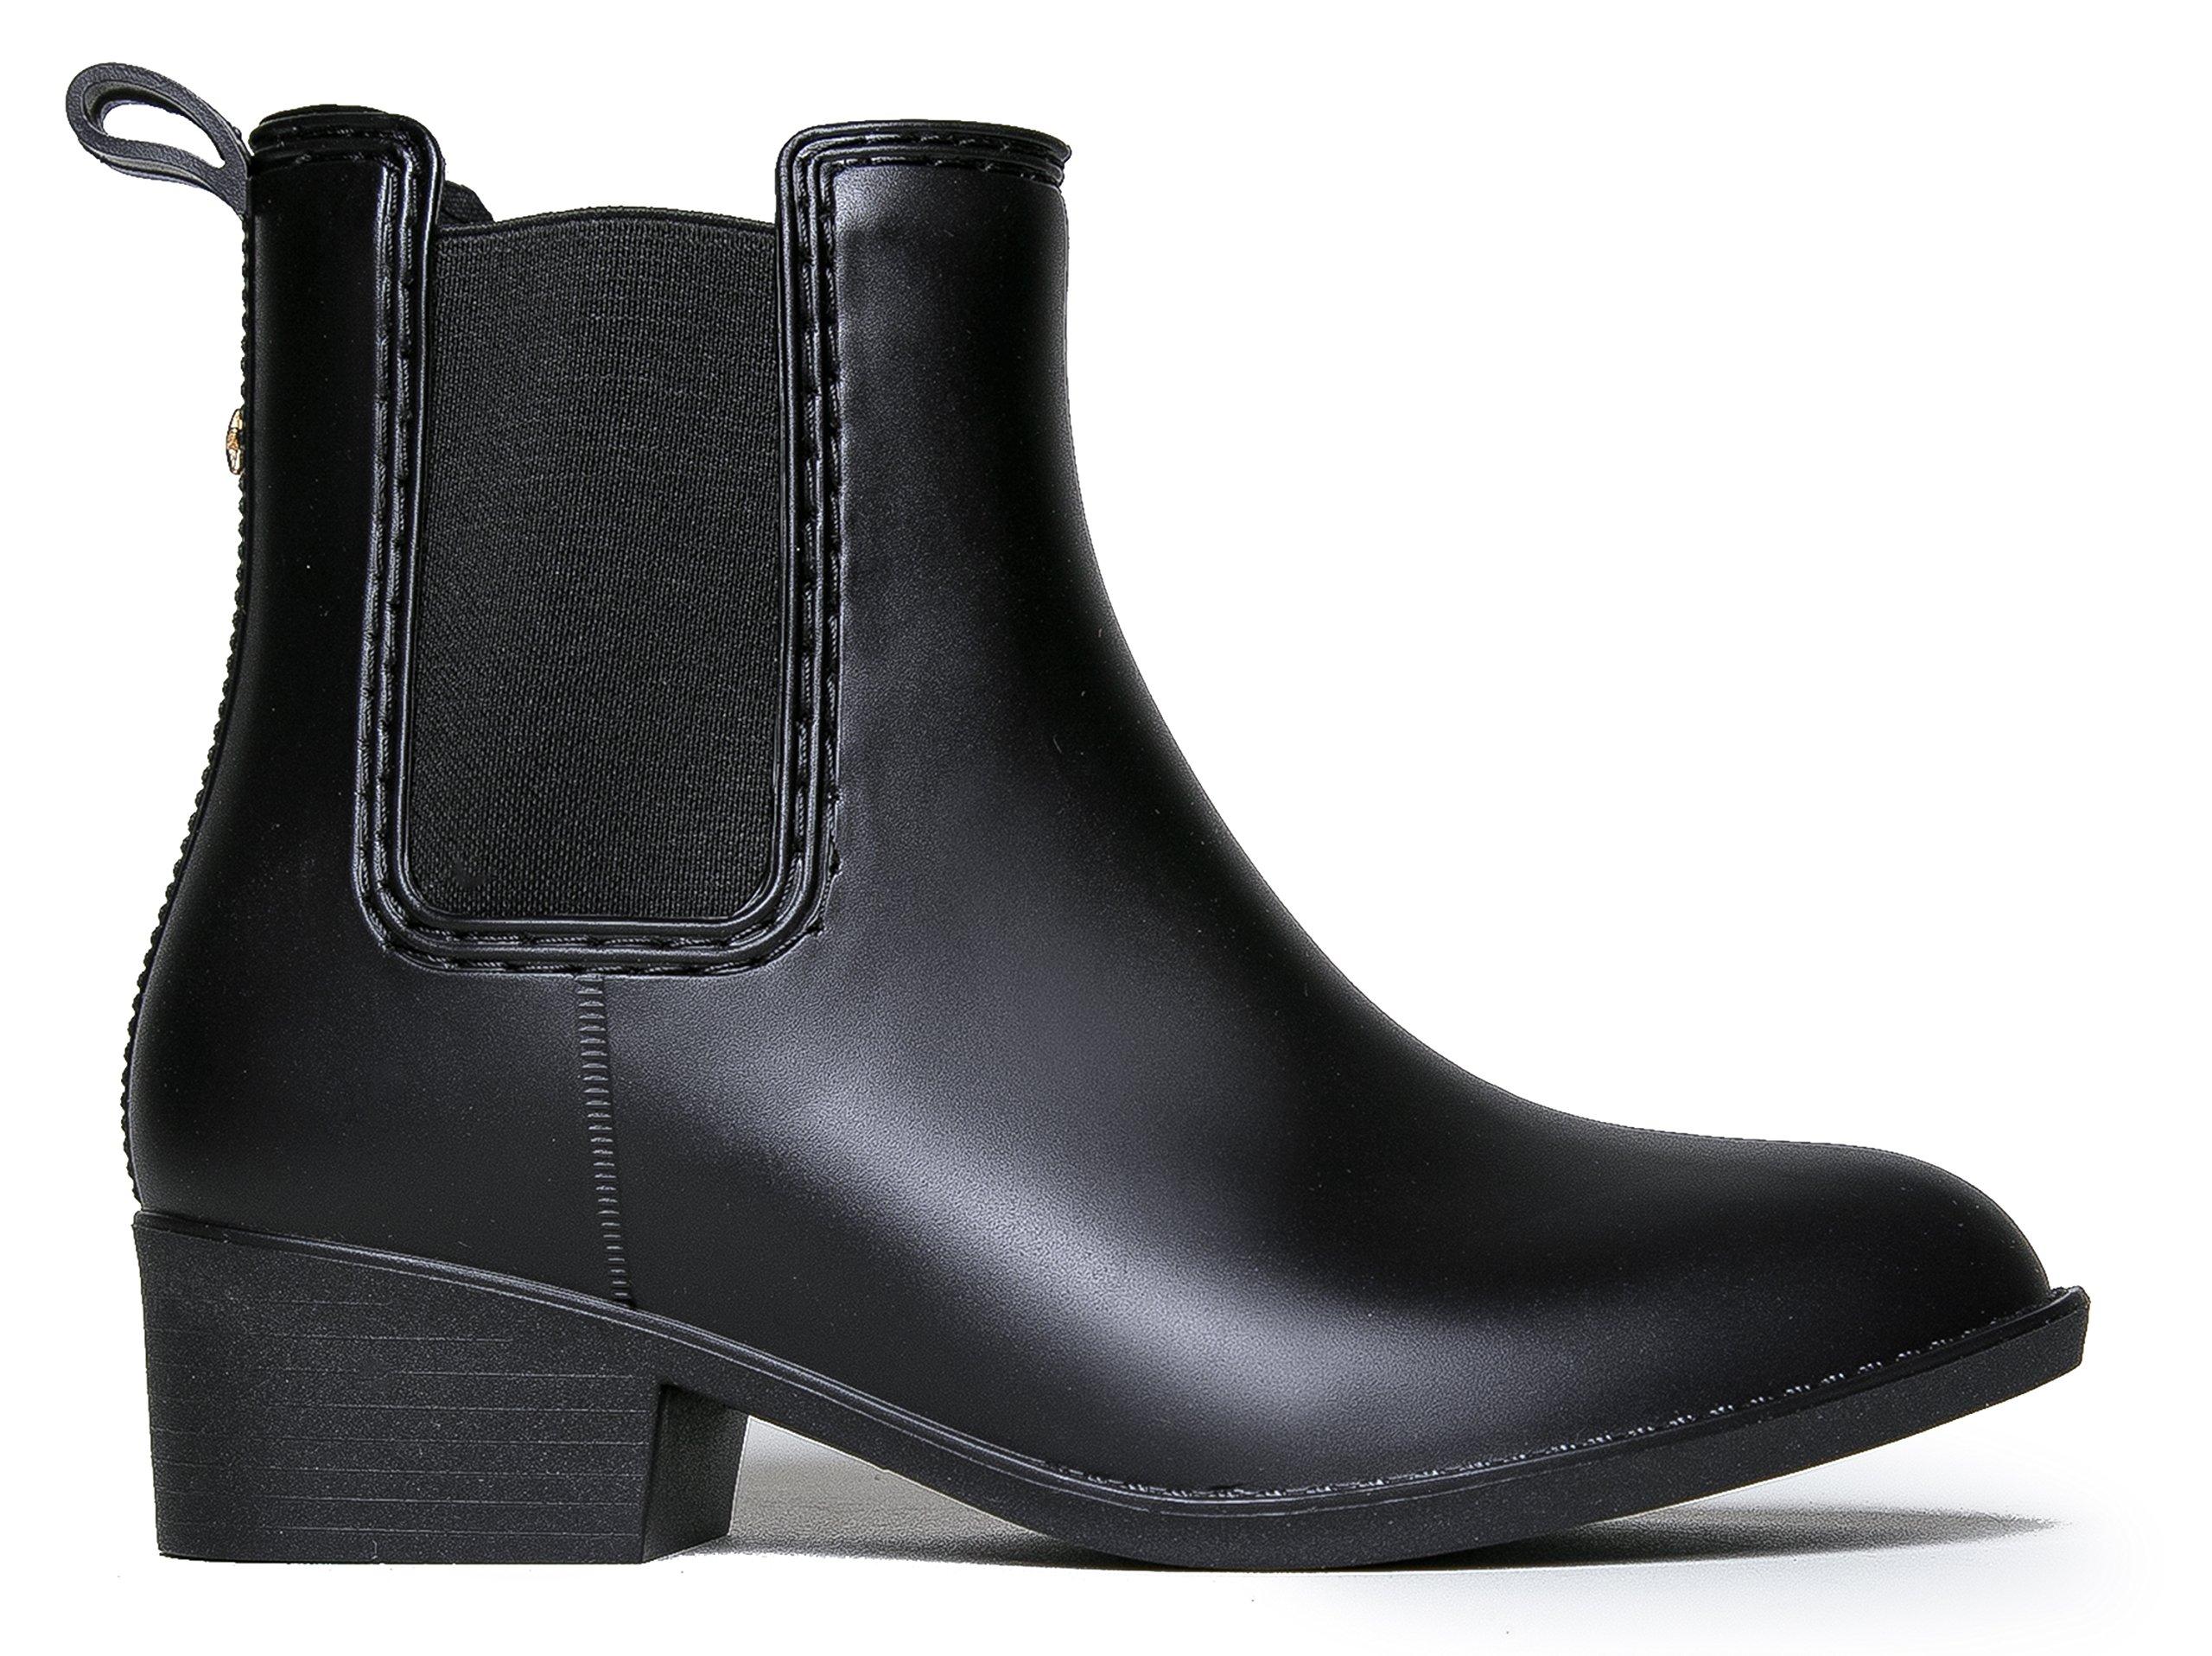 J. Adams Kaden Rain Boot - Casual Chelsea Low Heel Jelly Slip On Ankle Bootie